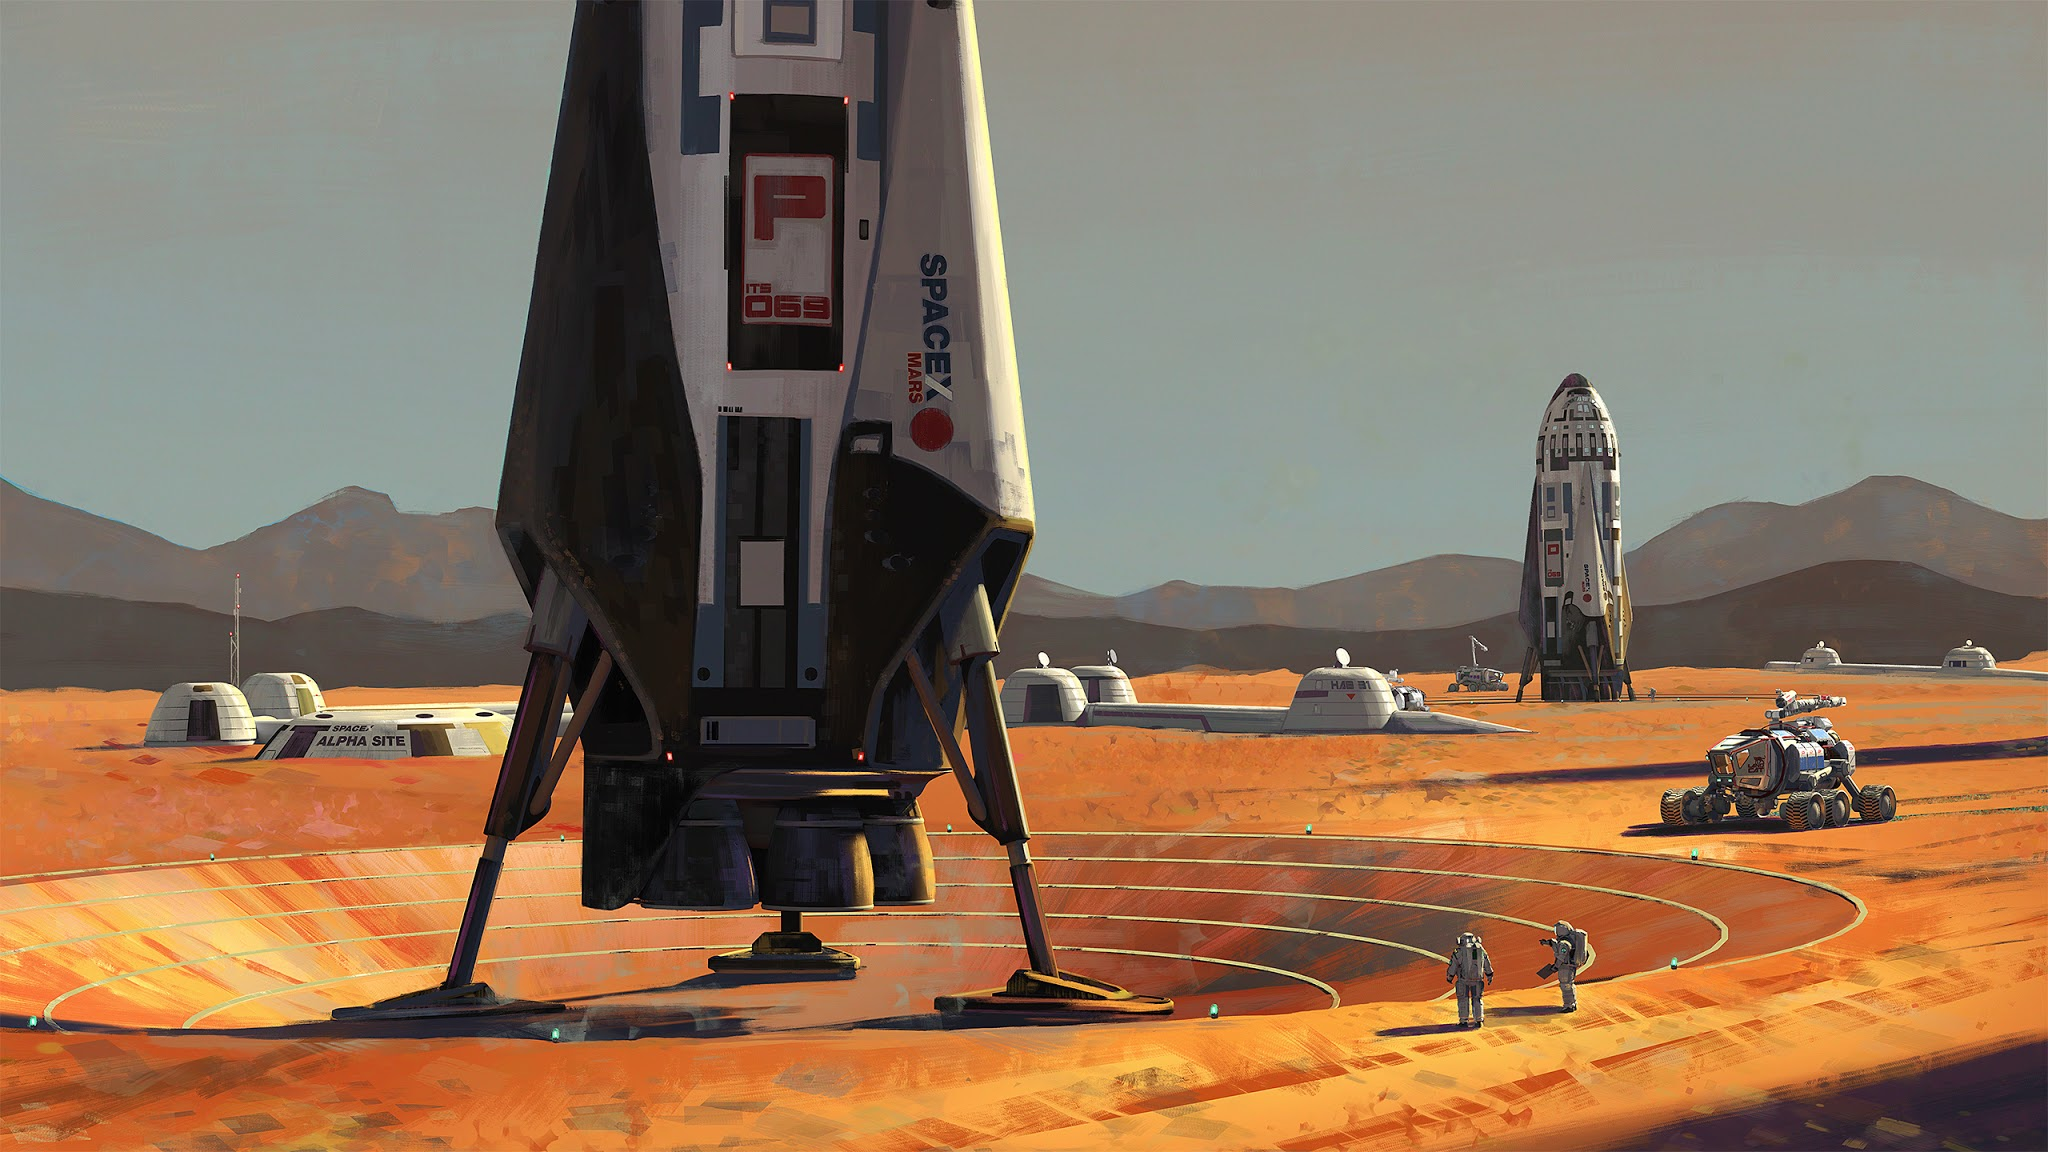 spacex mars base - photo #12